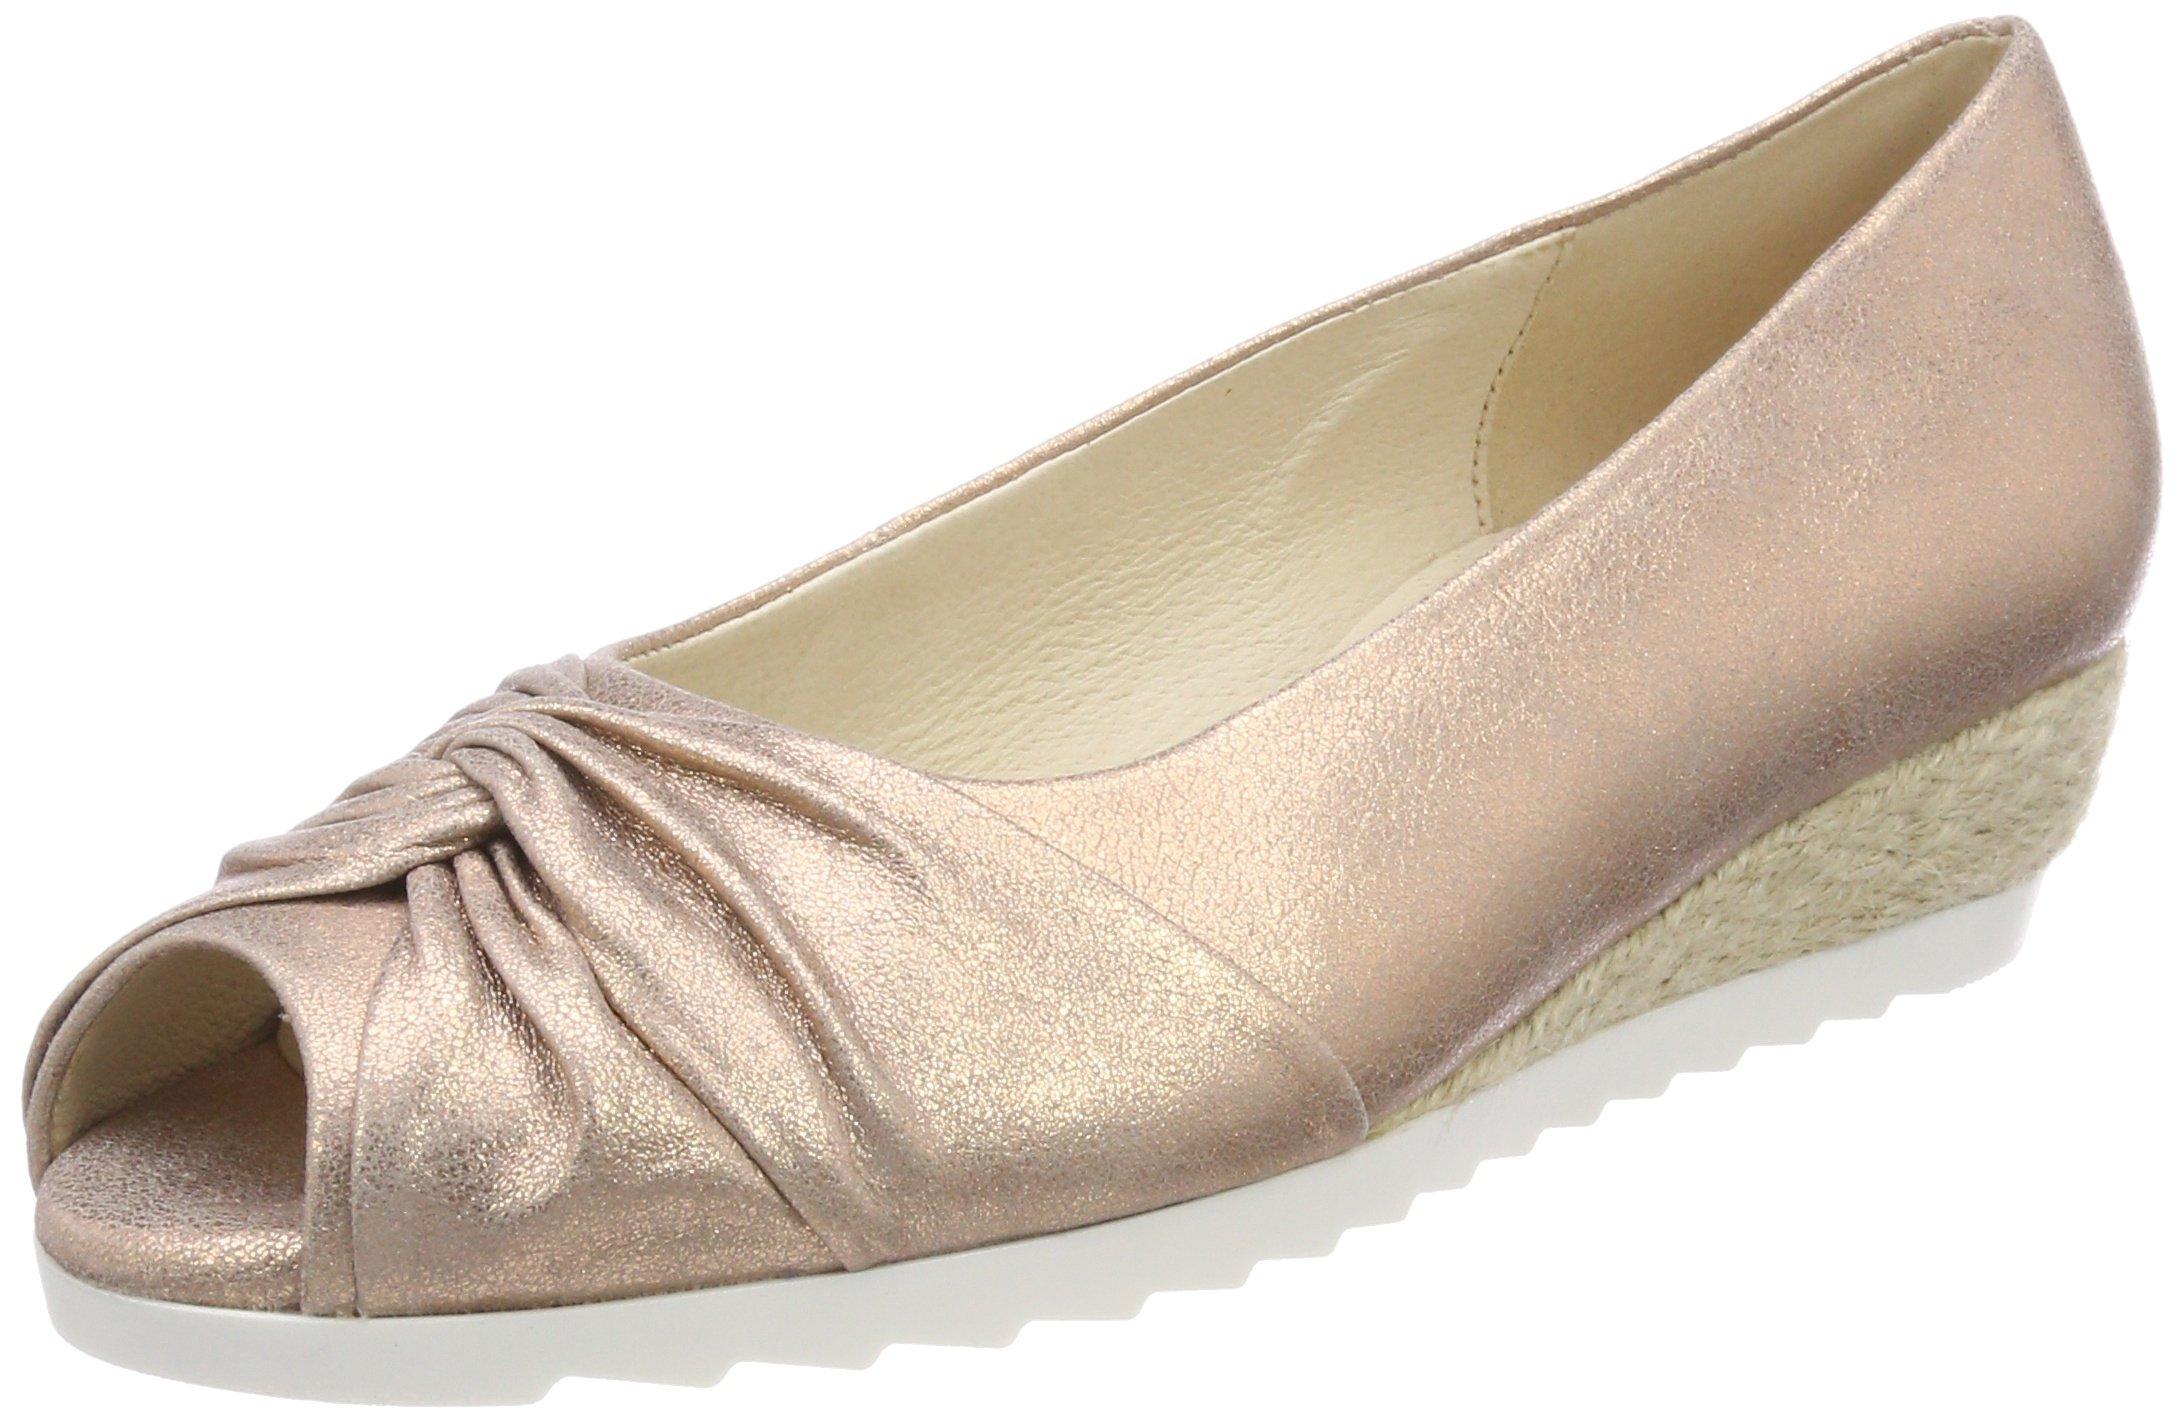 Comfort Gabor Eu SportEscarpins FemmeMulticolorecorallo Jute40 Shoes UMpGLqVSz